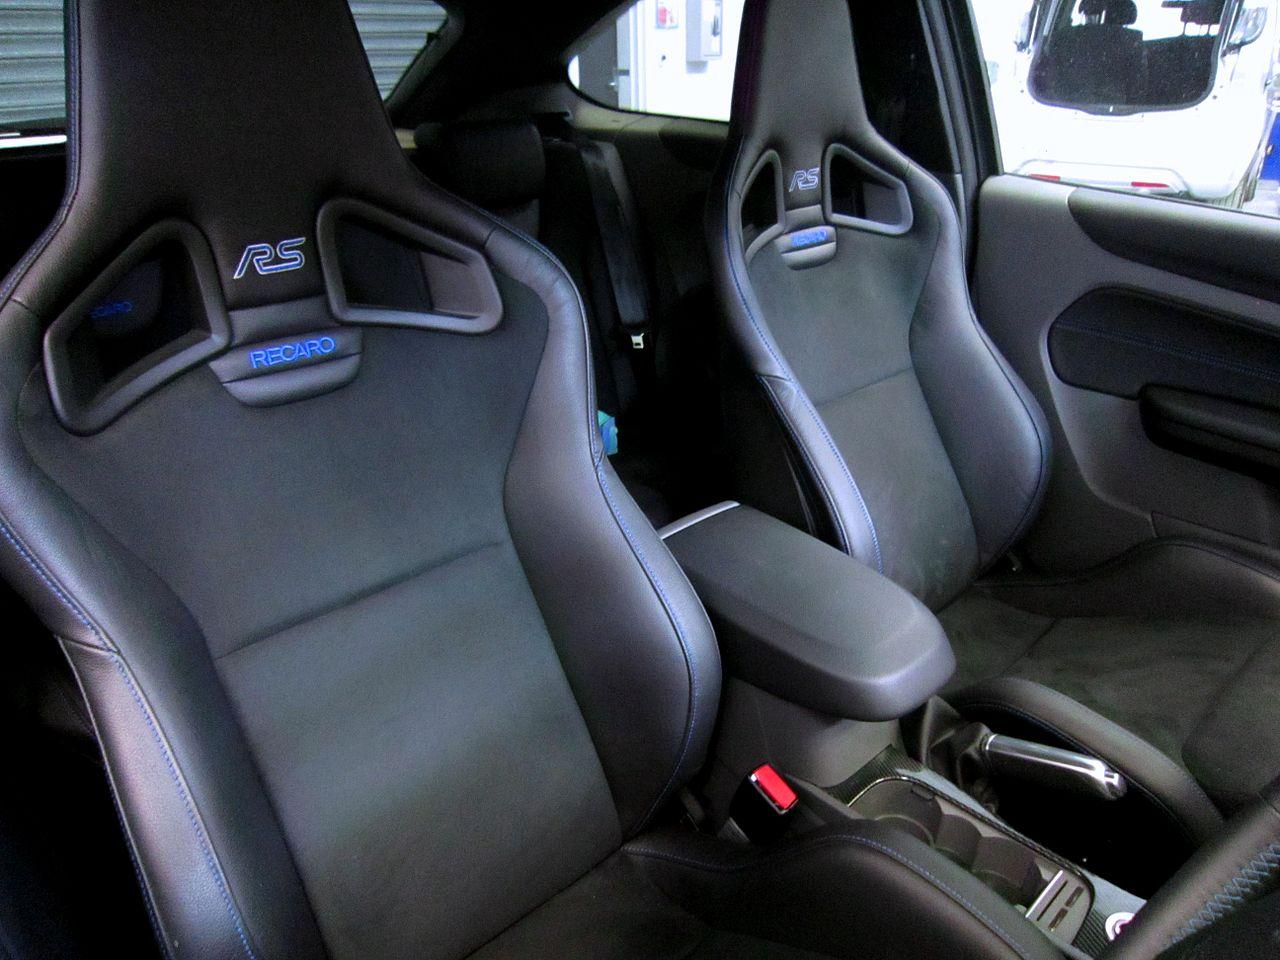 file ford focus rs nrma drivers seat flickr nrma new. Black Bedroom Furniture Sets. Home Design Ideas